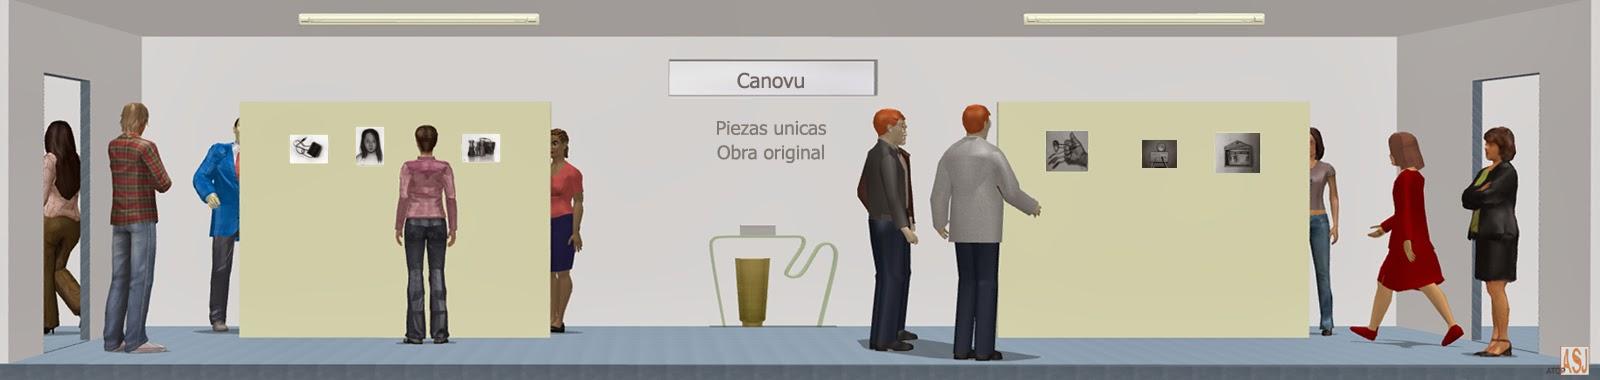 "<img src=""http://3.bp.blogspot.com/-nyU8ia1lN_M/UvJZBBFn3pI/AAAAAAAAUnQ/WB_0OTmqTwc/s1600/sala-de-exposicion-virtual-de-canovu.jpg"" alt=""Sala de exposición virtual de pinturas y dibujos de Canovu""/>"